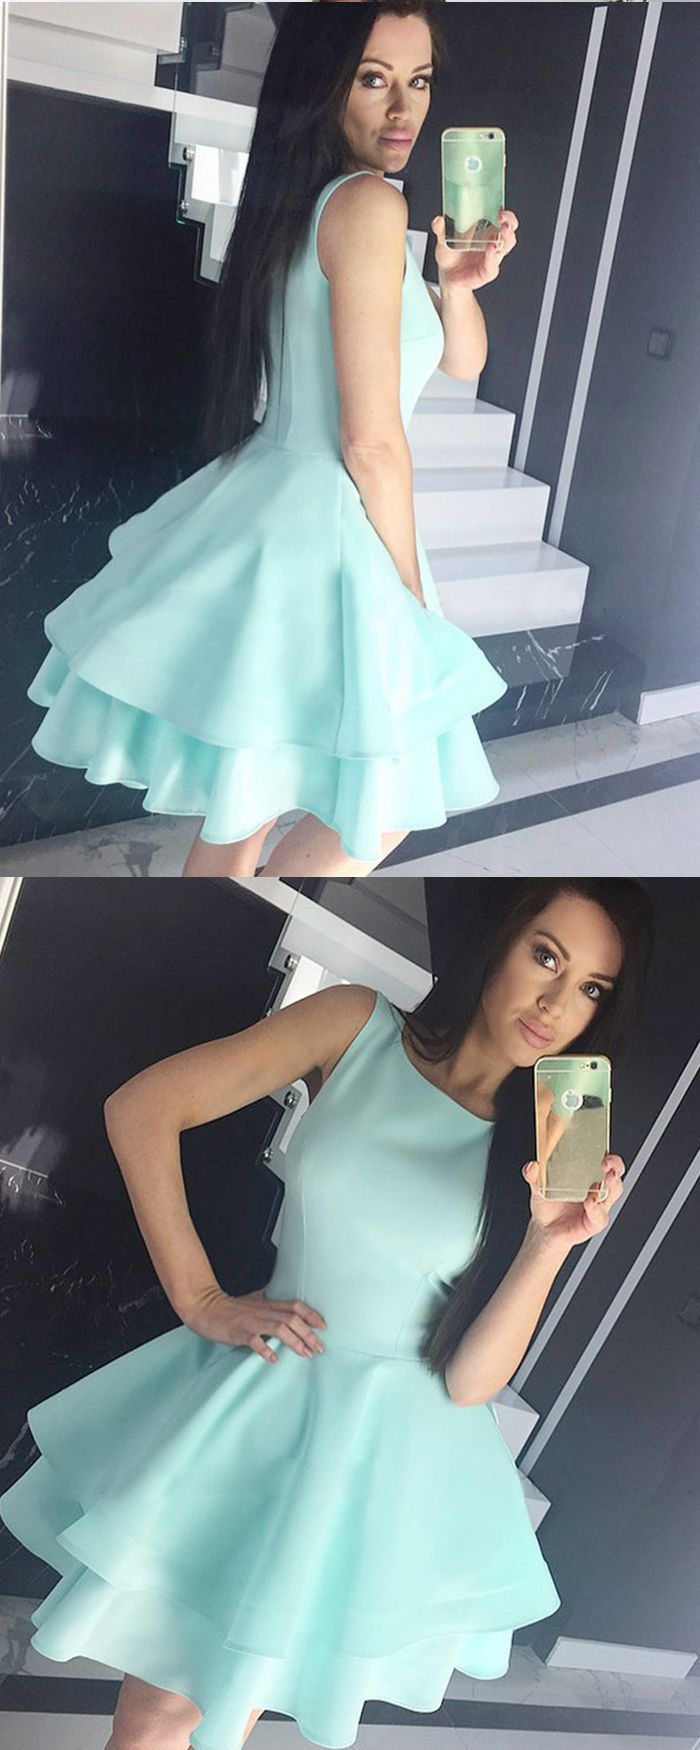 f63b343abd1 Jewel Cyan Fit   Flare Satin Homecoming Dress with Layered Skirt ...